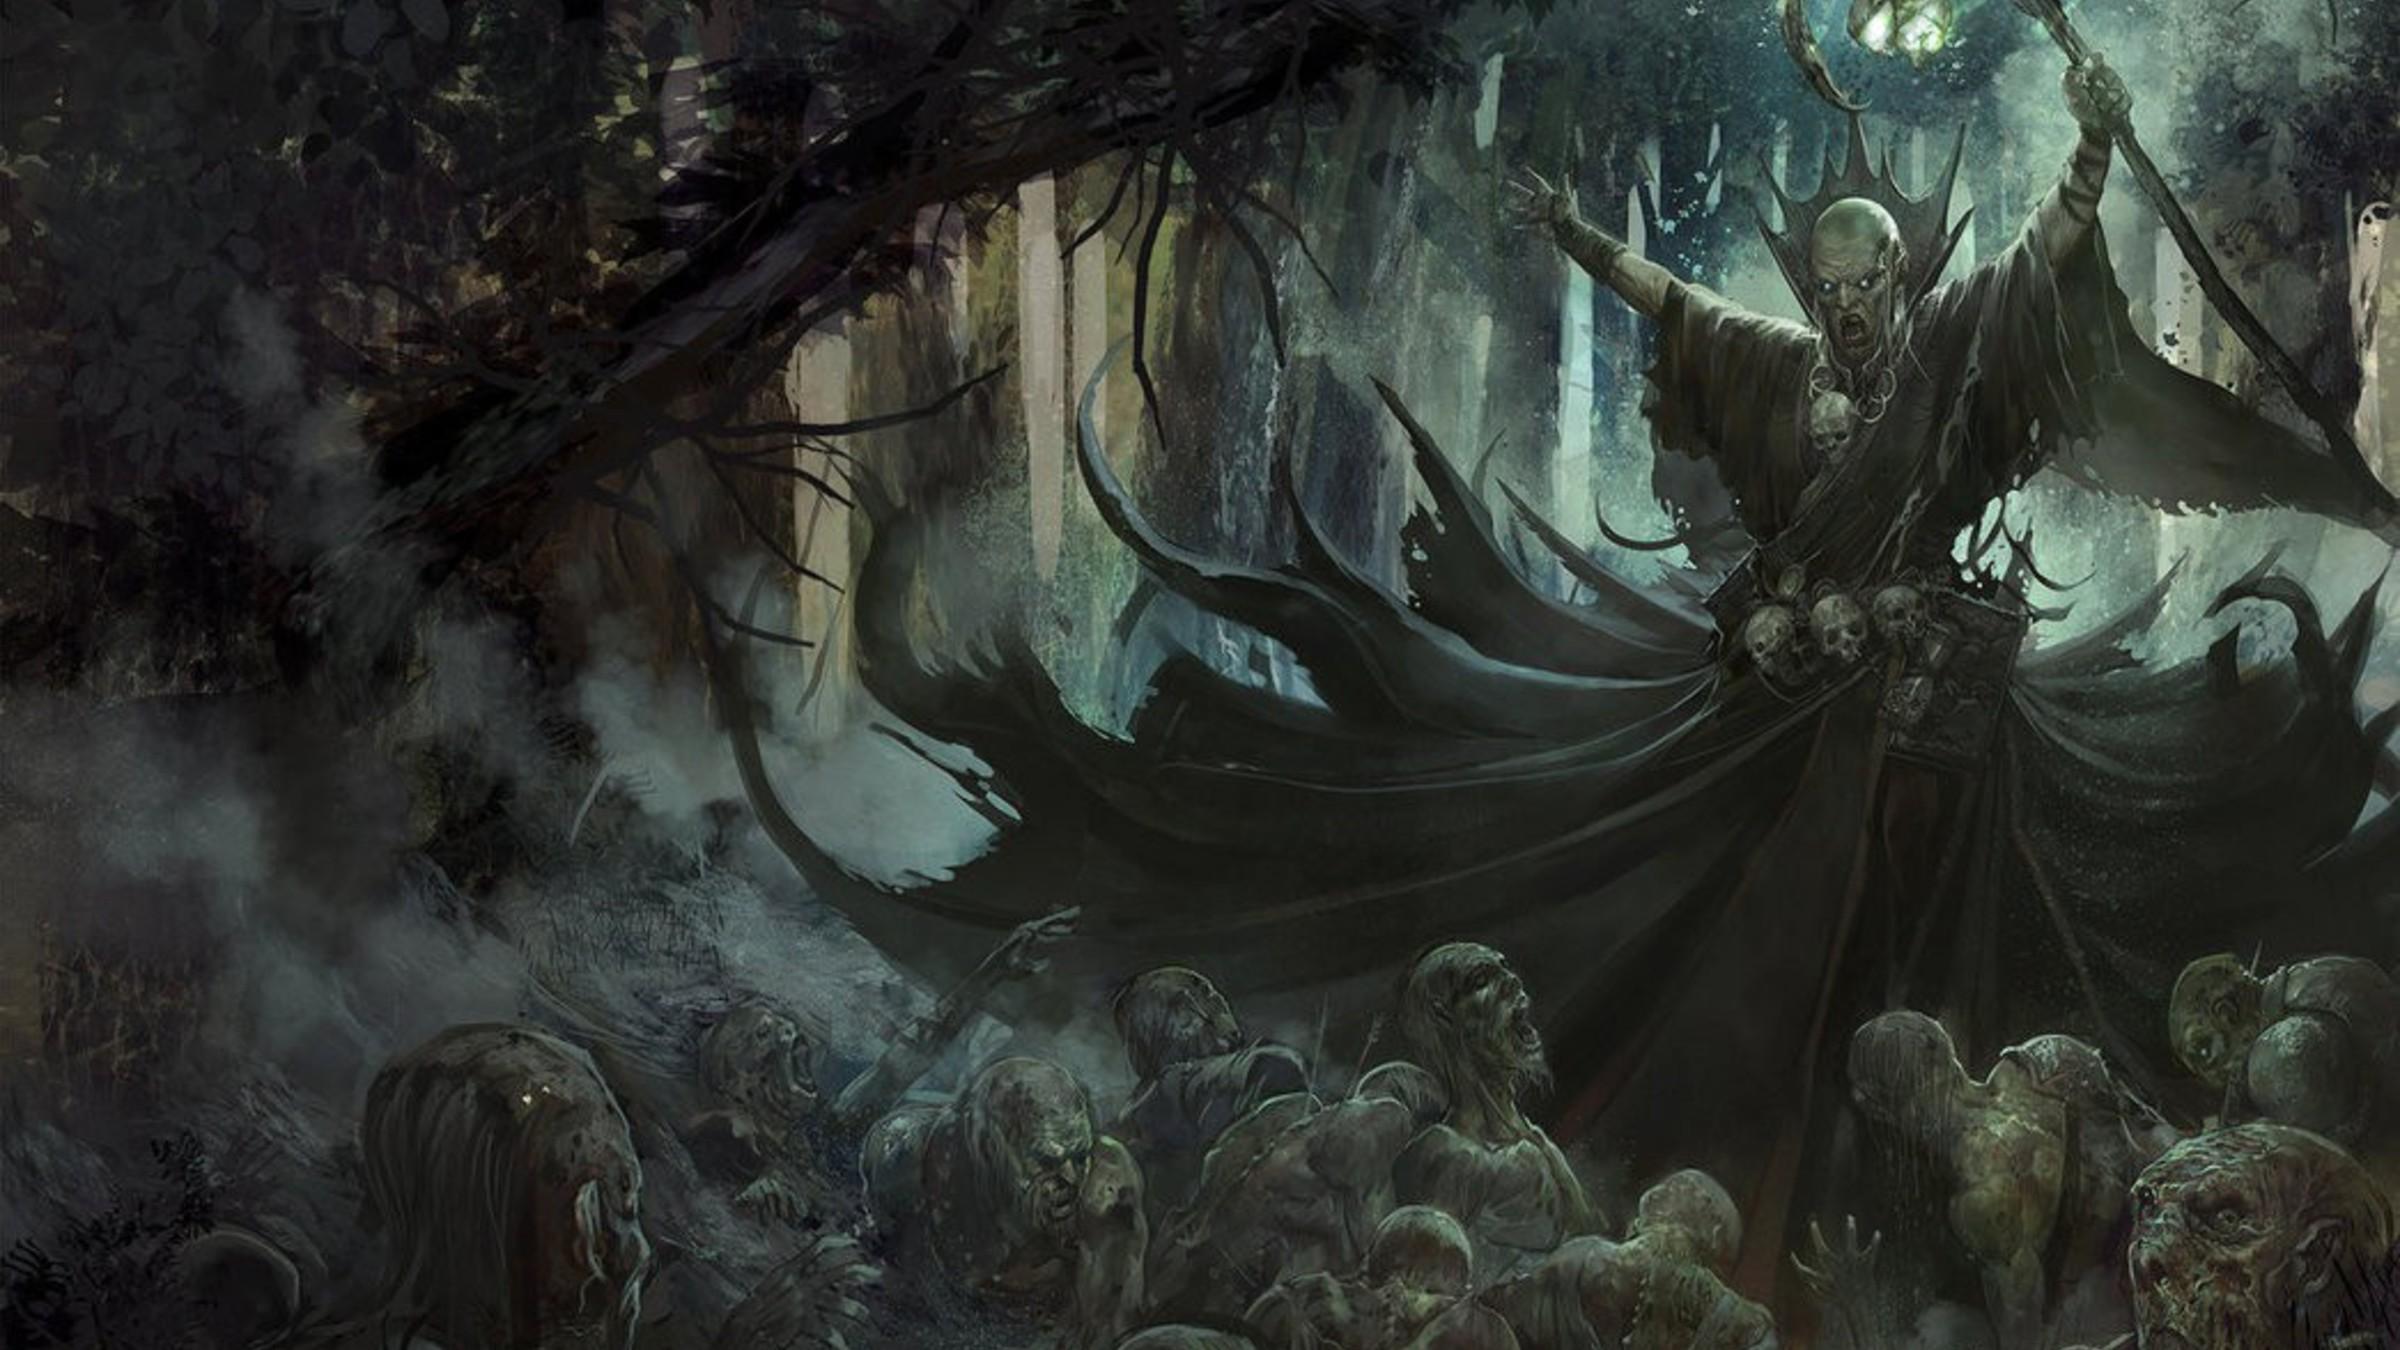 Res: 2400x1350, Necromancer artwork fantasy art forests undead wallpaper